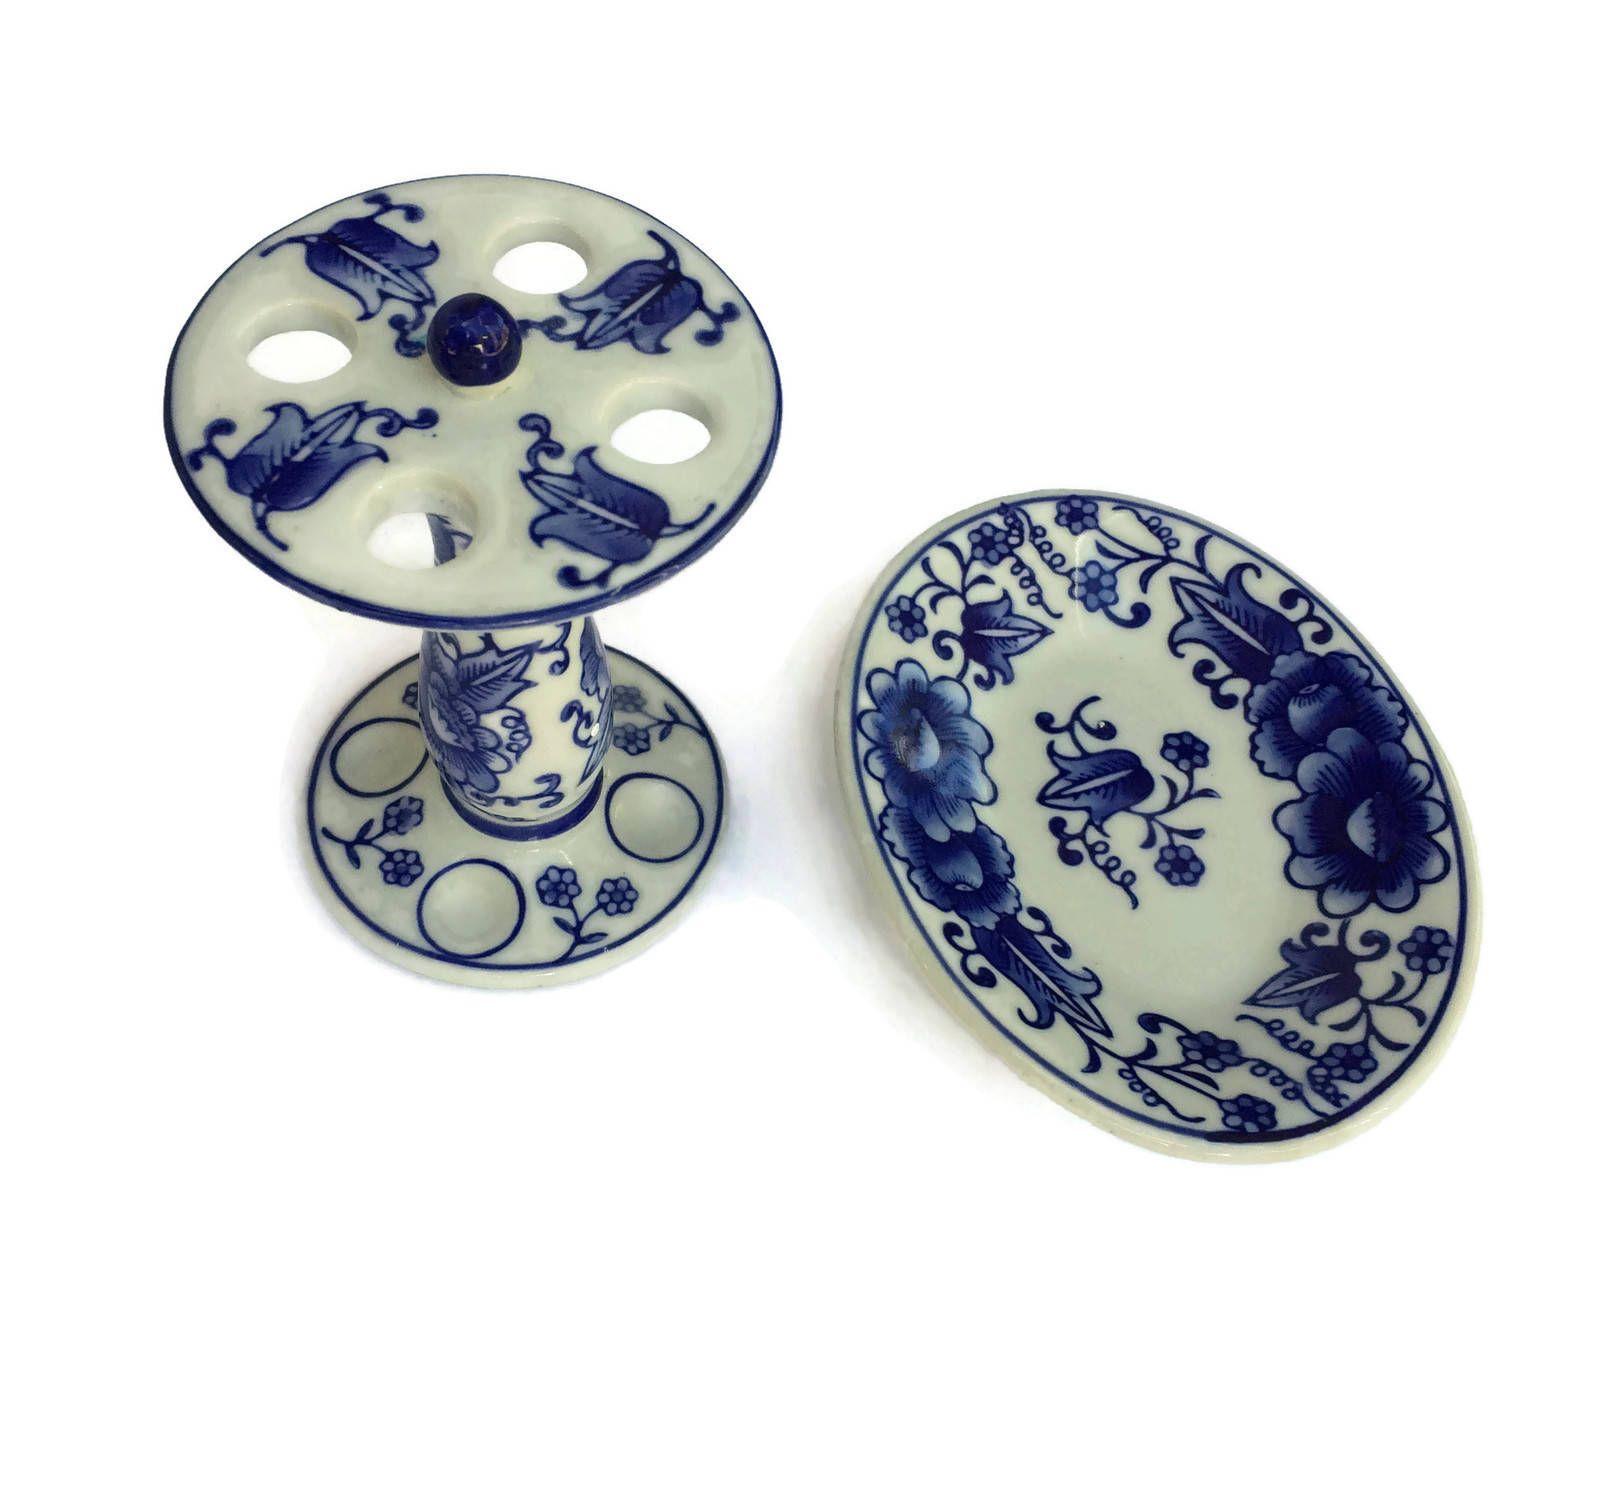 Vintage Chinese Porcelain Pedestal Soap Dish and Toothbrush Holder ...